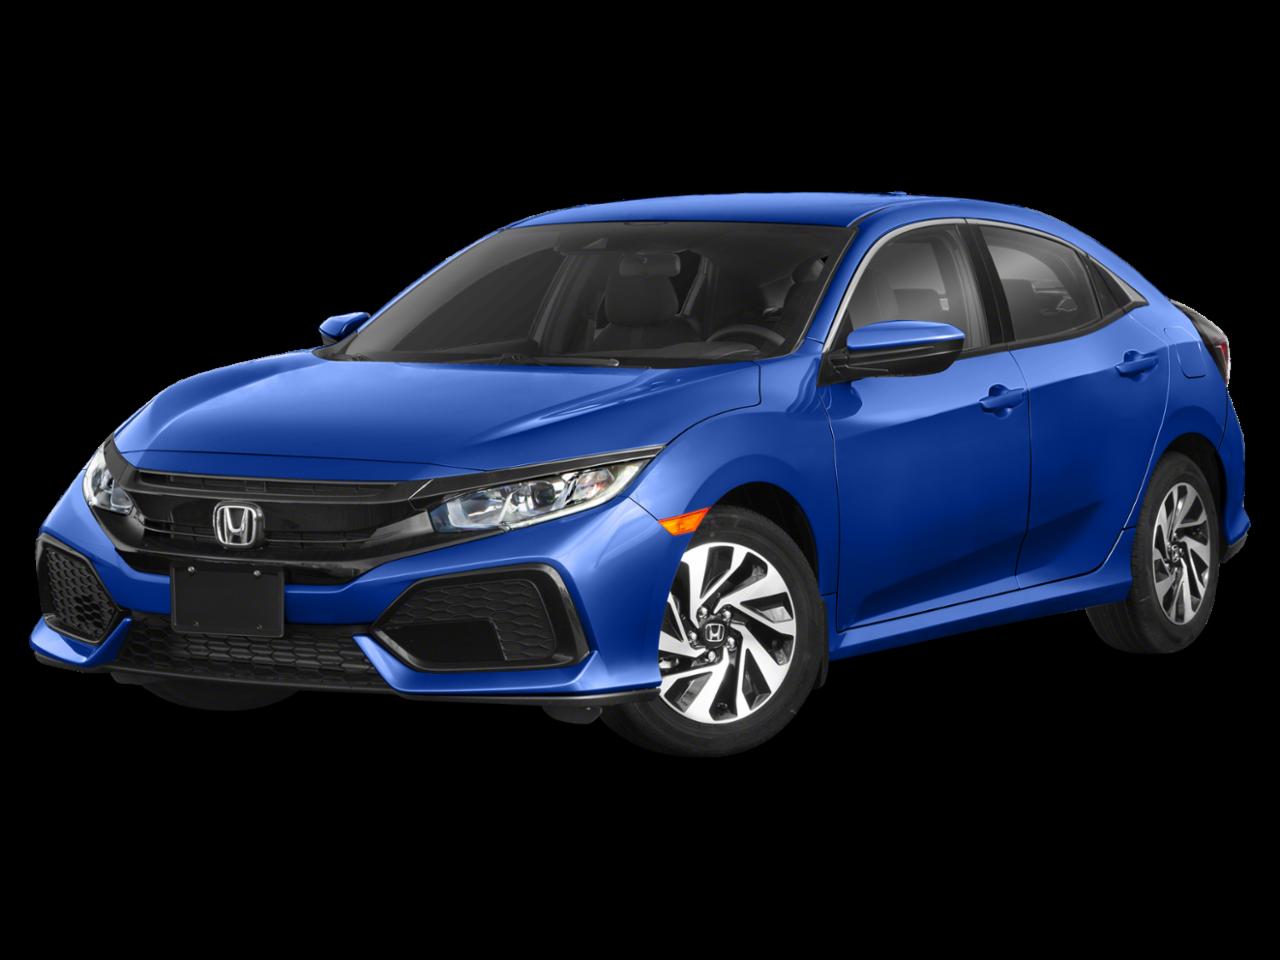 Honda 2019 Civic Hatchback LX